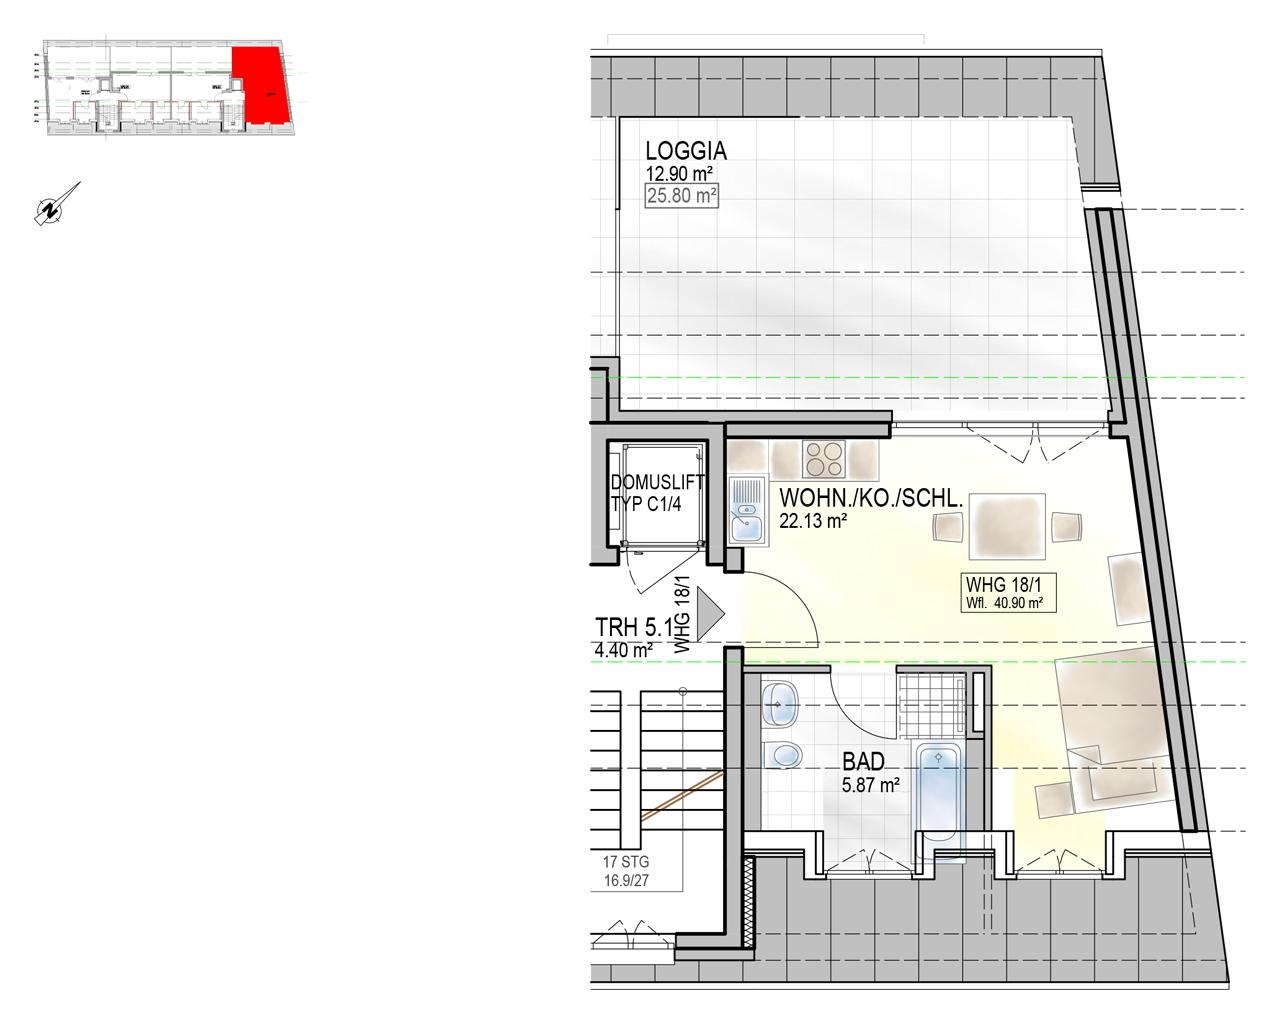 Nr. 18/1 - DG - 1 Zimmer - 40,66m² - 184,100 €